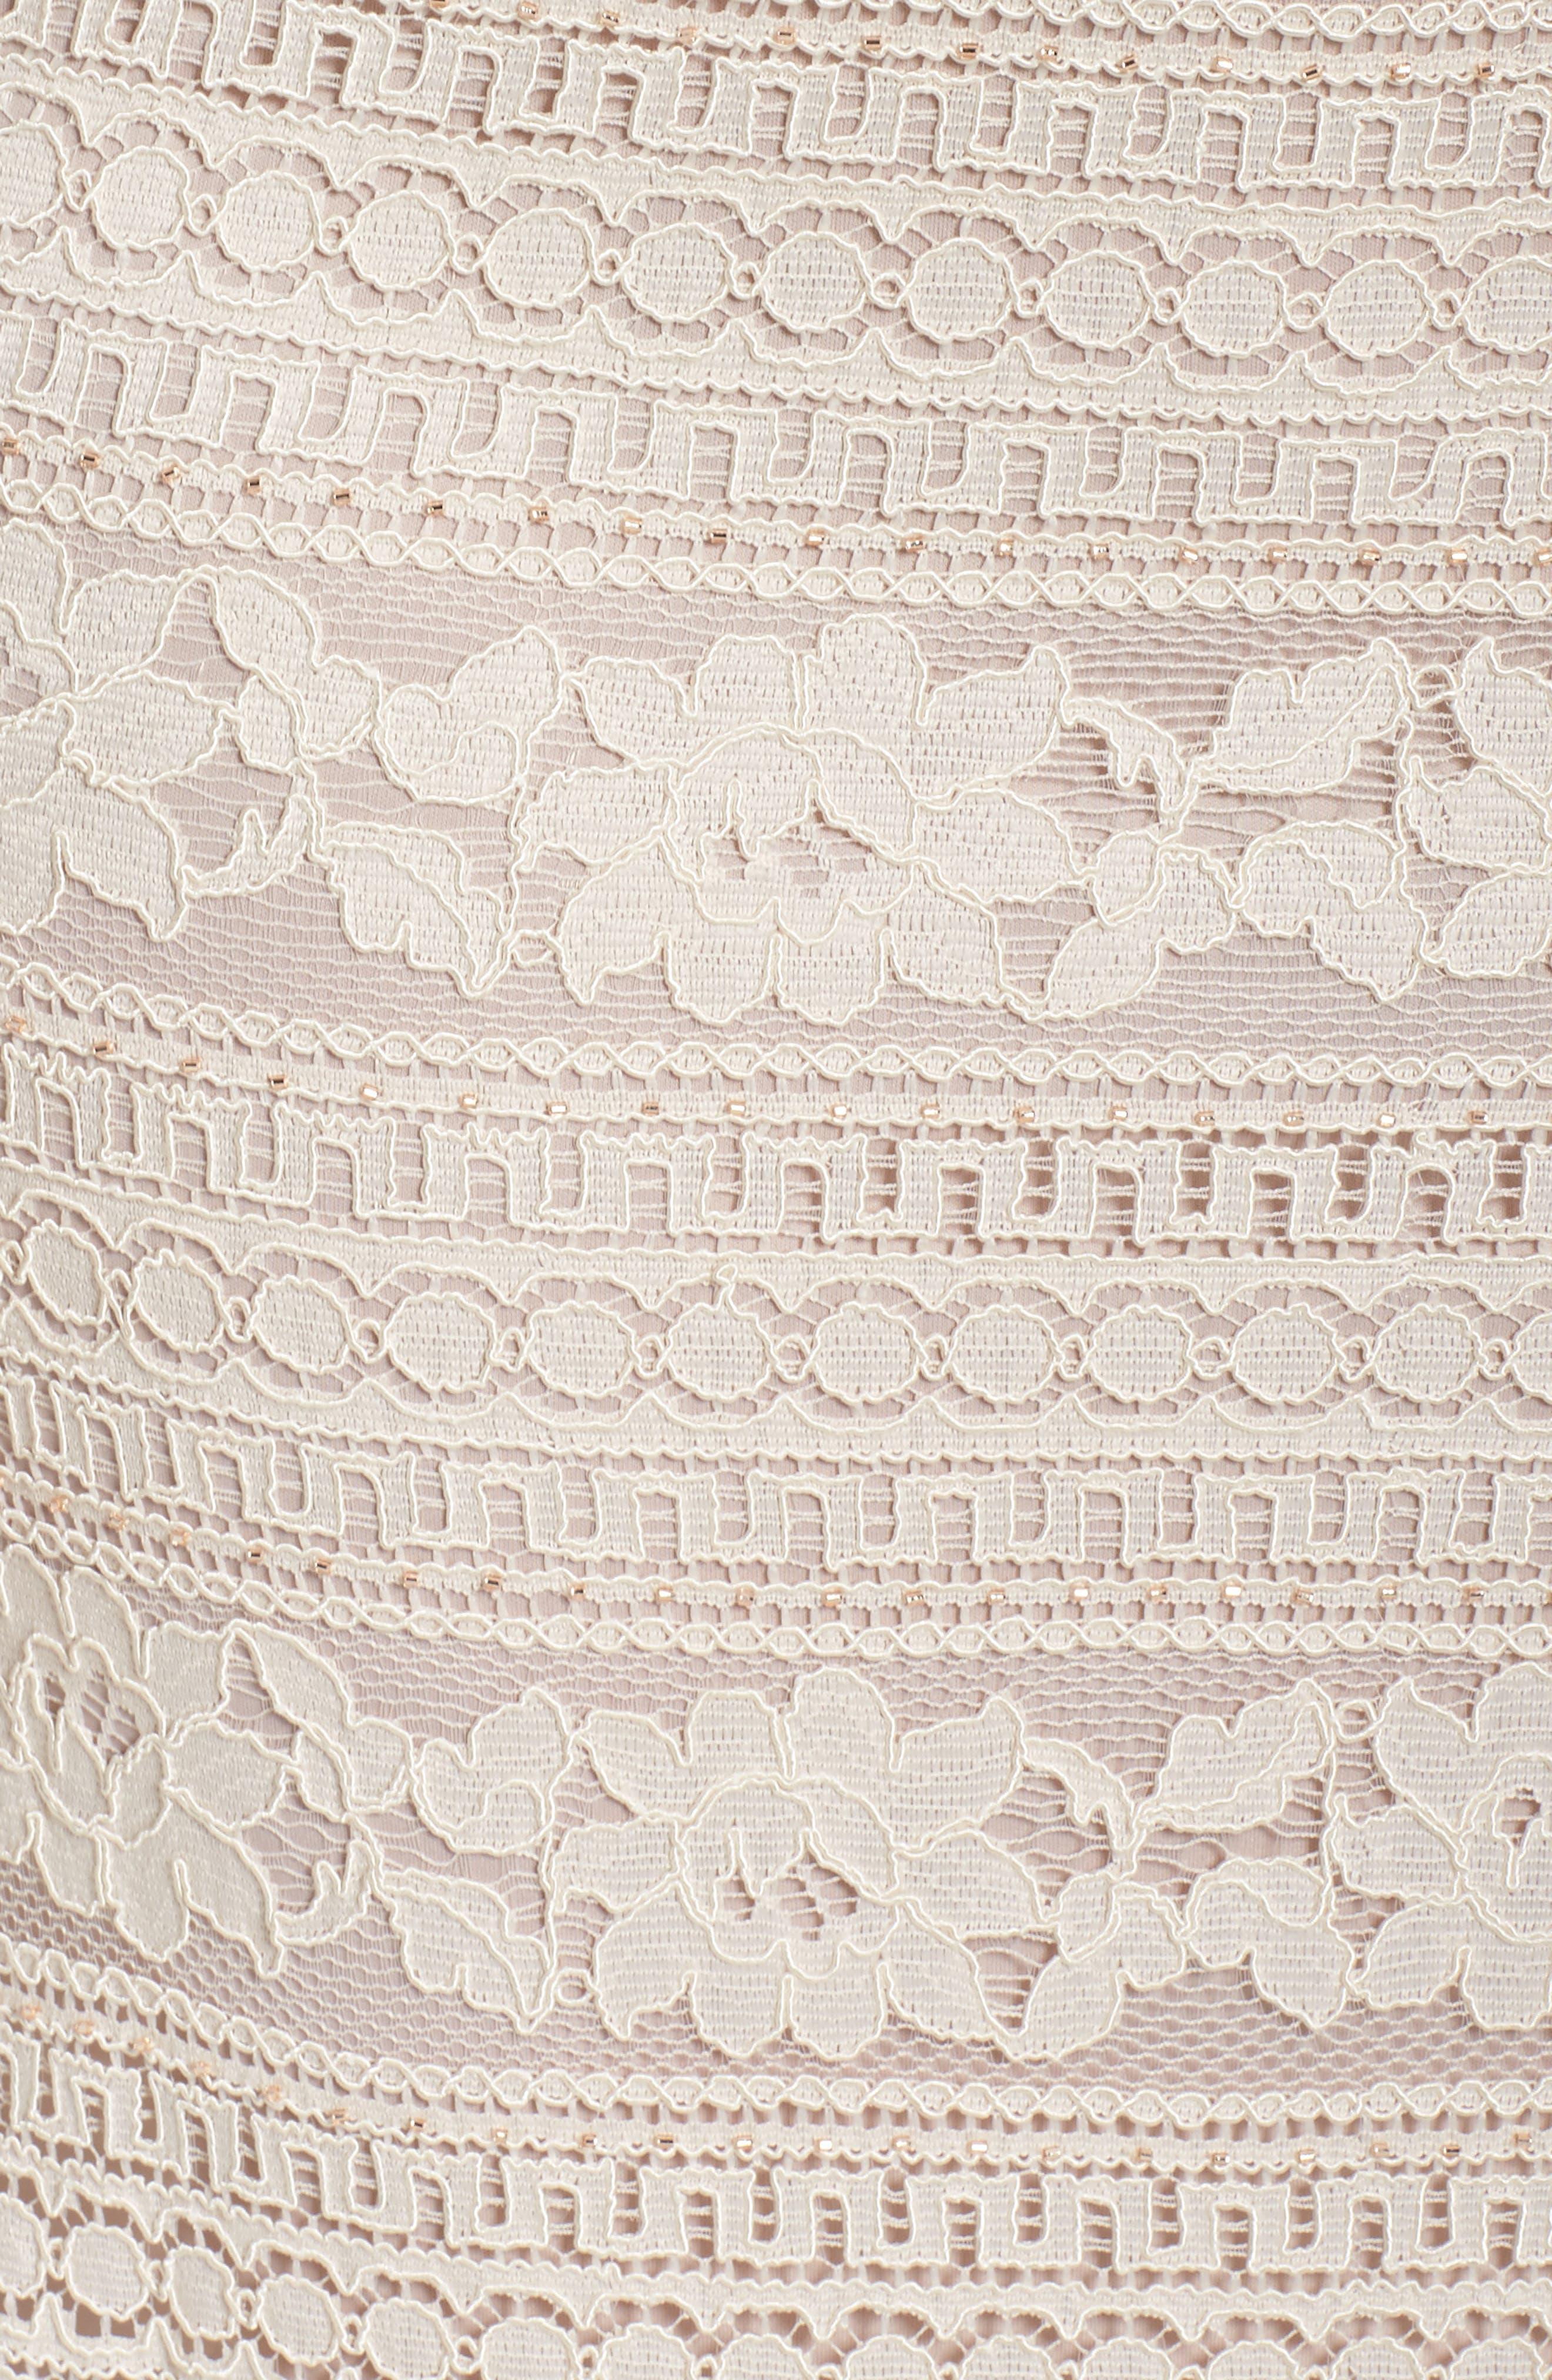 Illusion Lace Column Gown,                             Alternate thumbnail 5, color,                             650